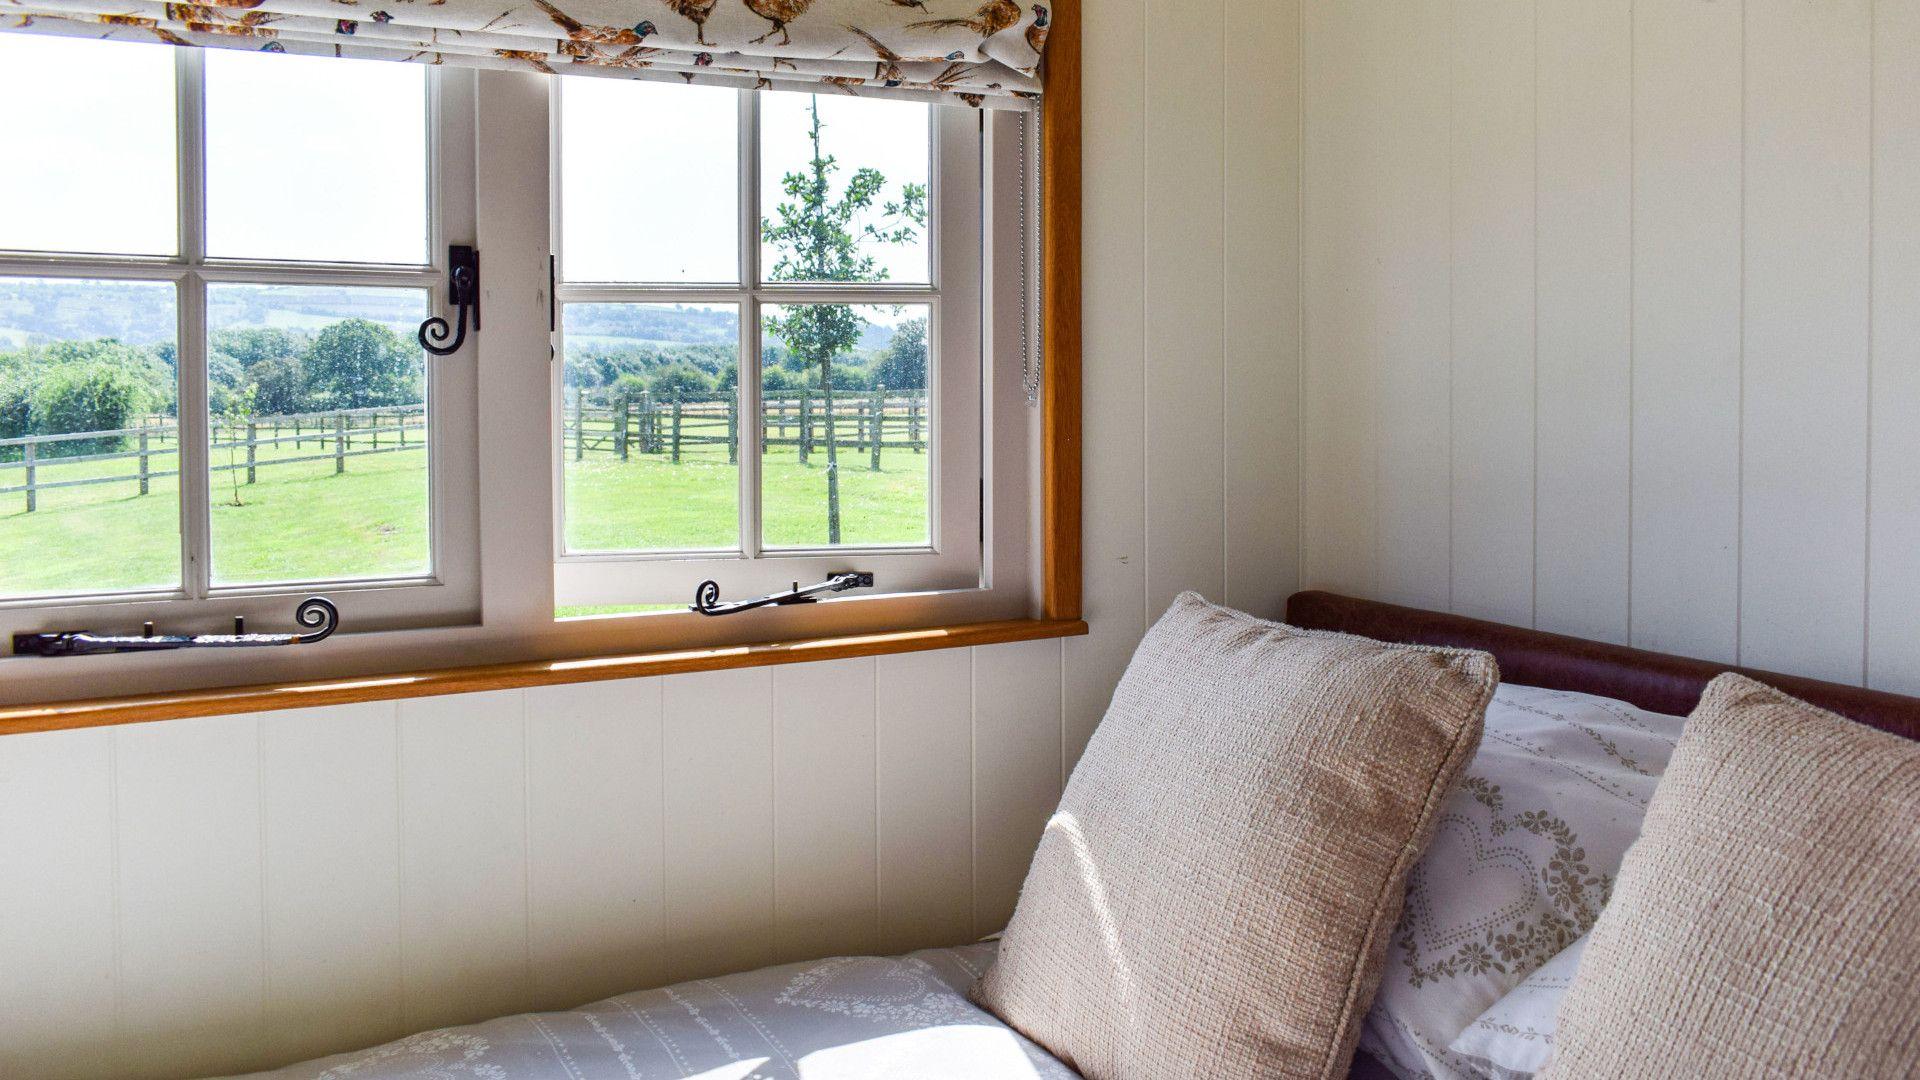 Bed and views, Shepherds Hut at Avon Farm, Bolthole Retreats